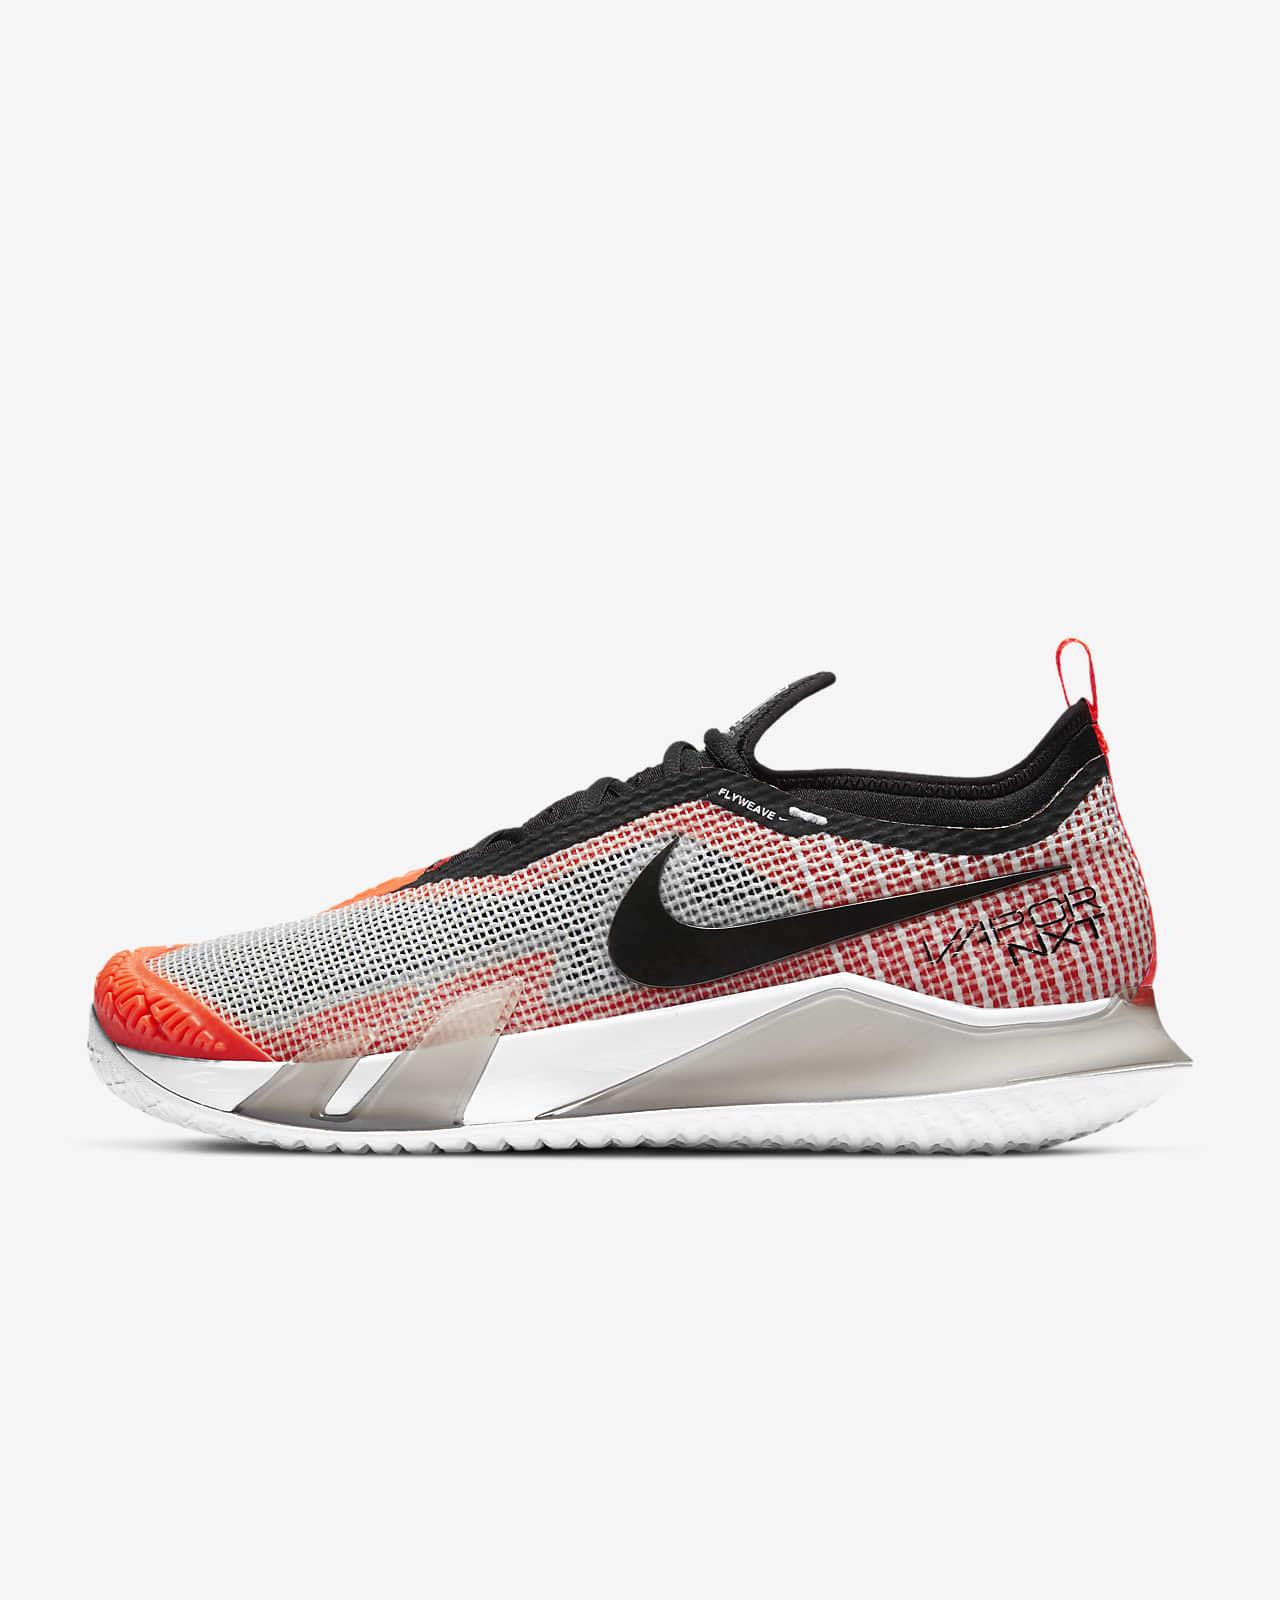 NikeCourt React Vapor NXT Men's Hard Court Tennis Shoes. Nike JP